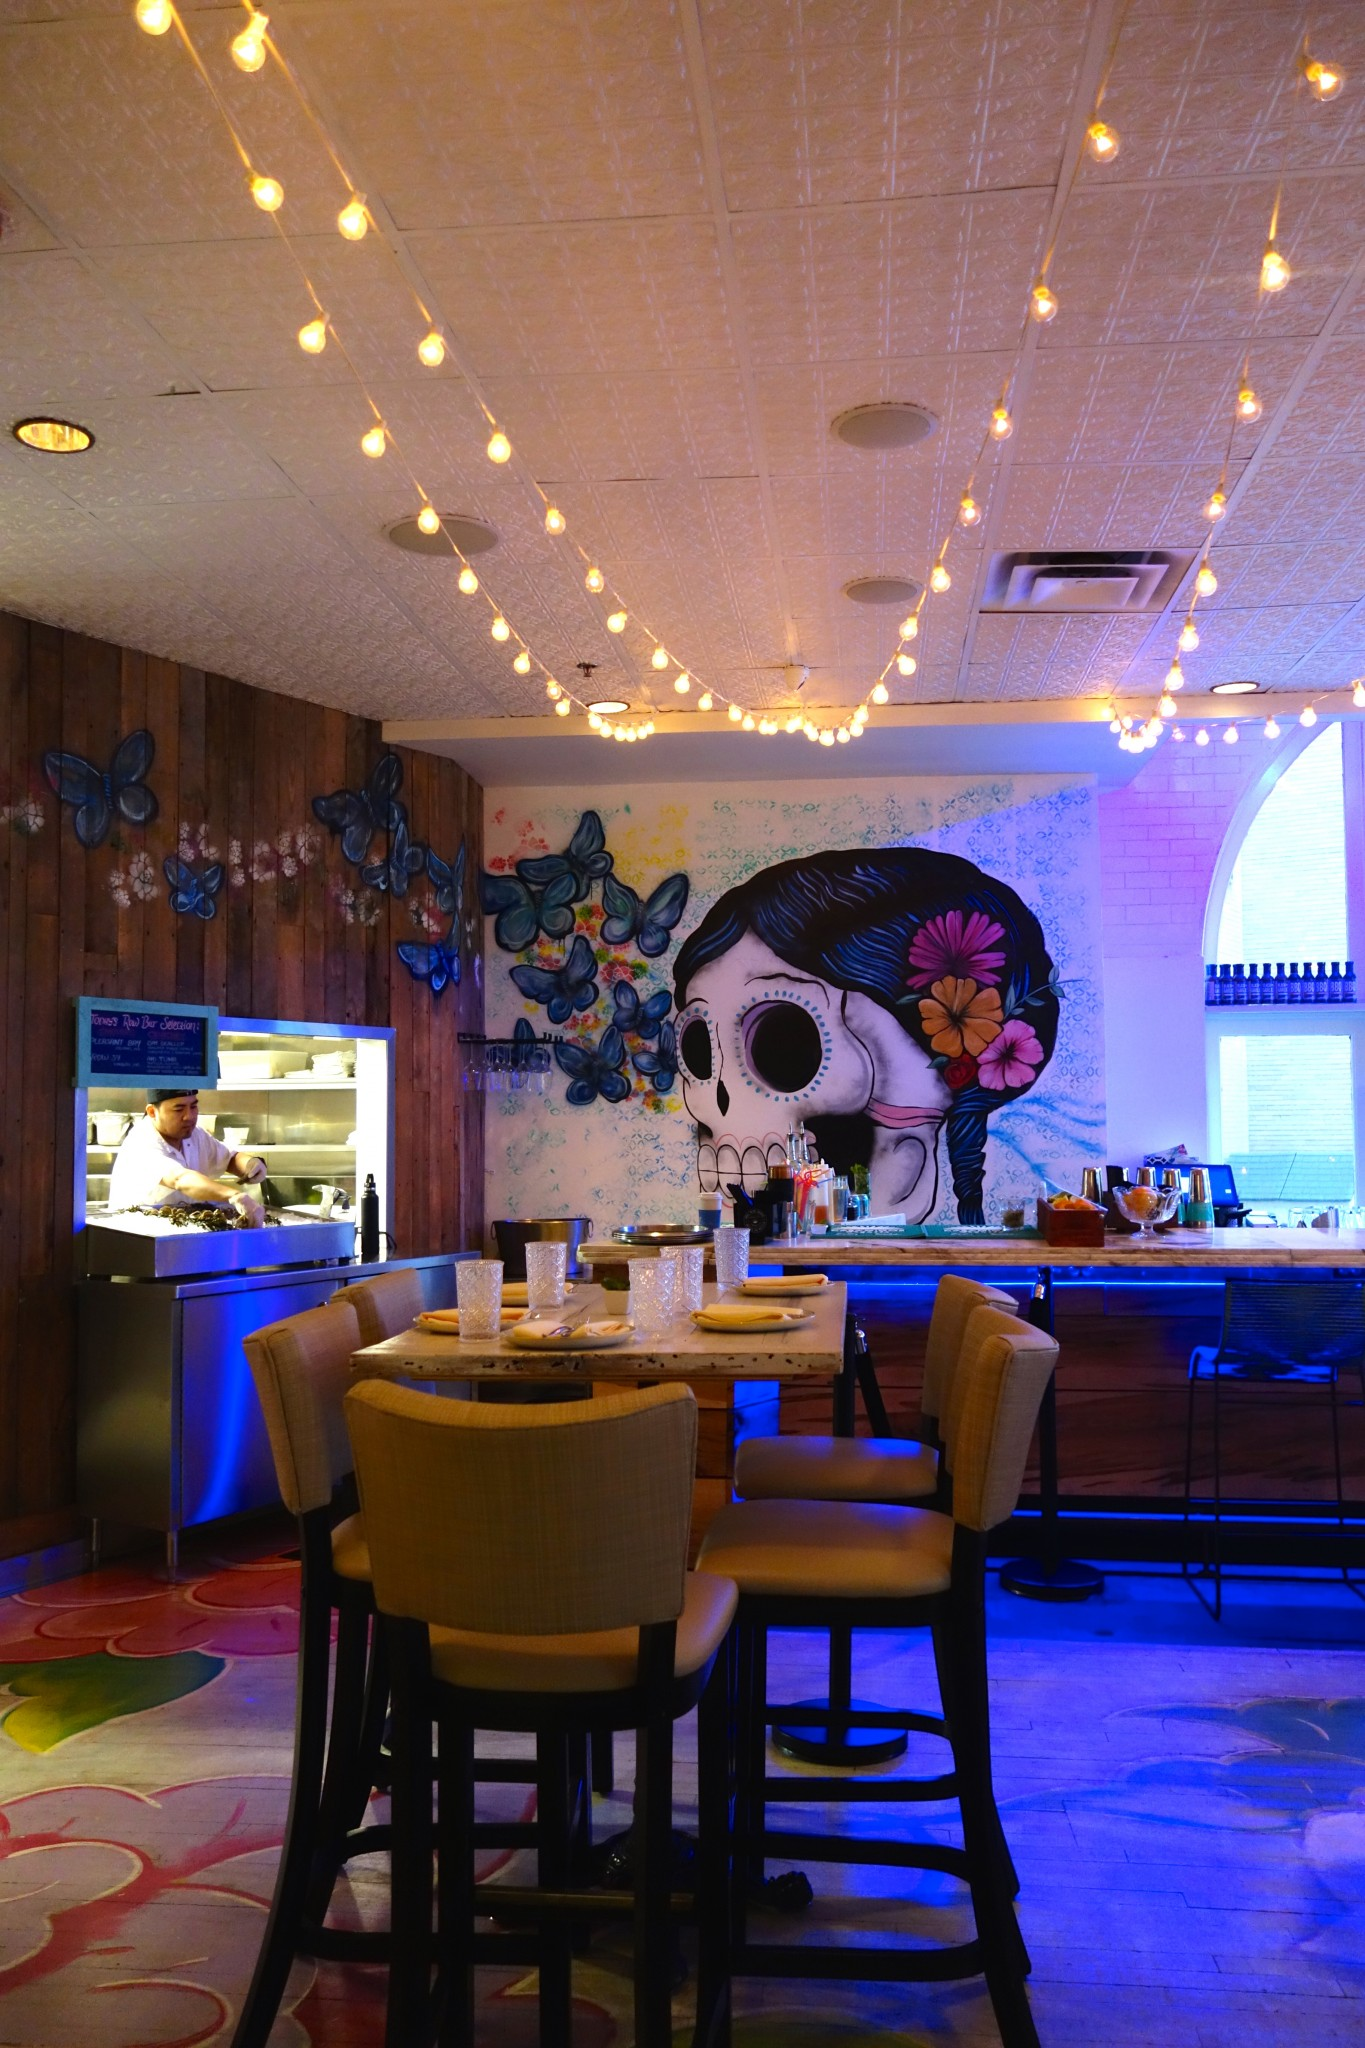 DSC02317instagrammable restaurants in boston, the-alyst.com